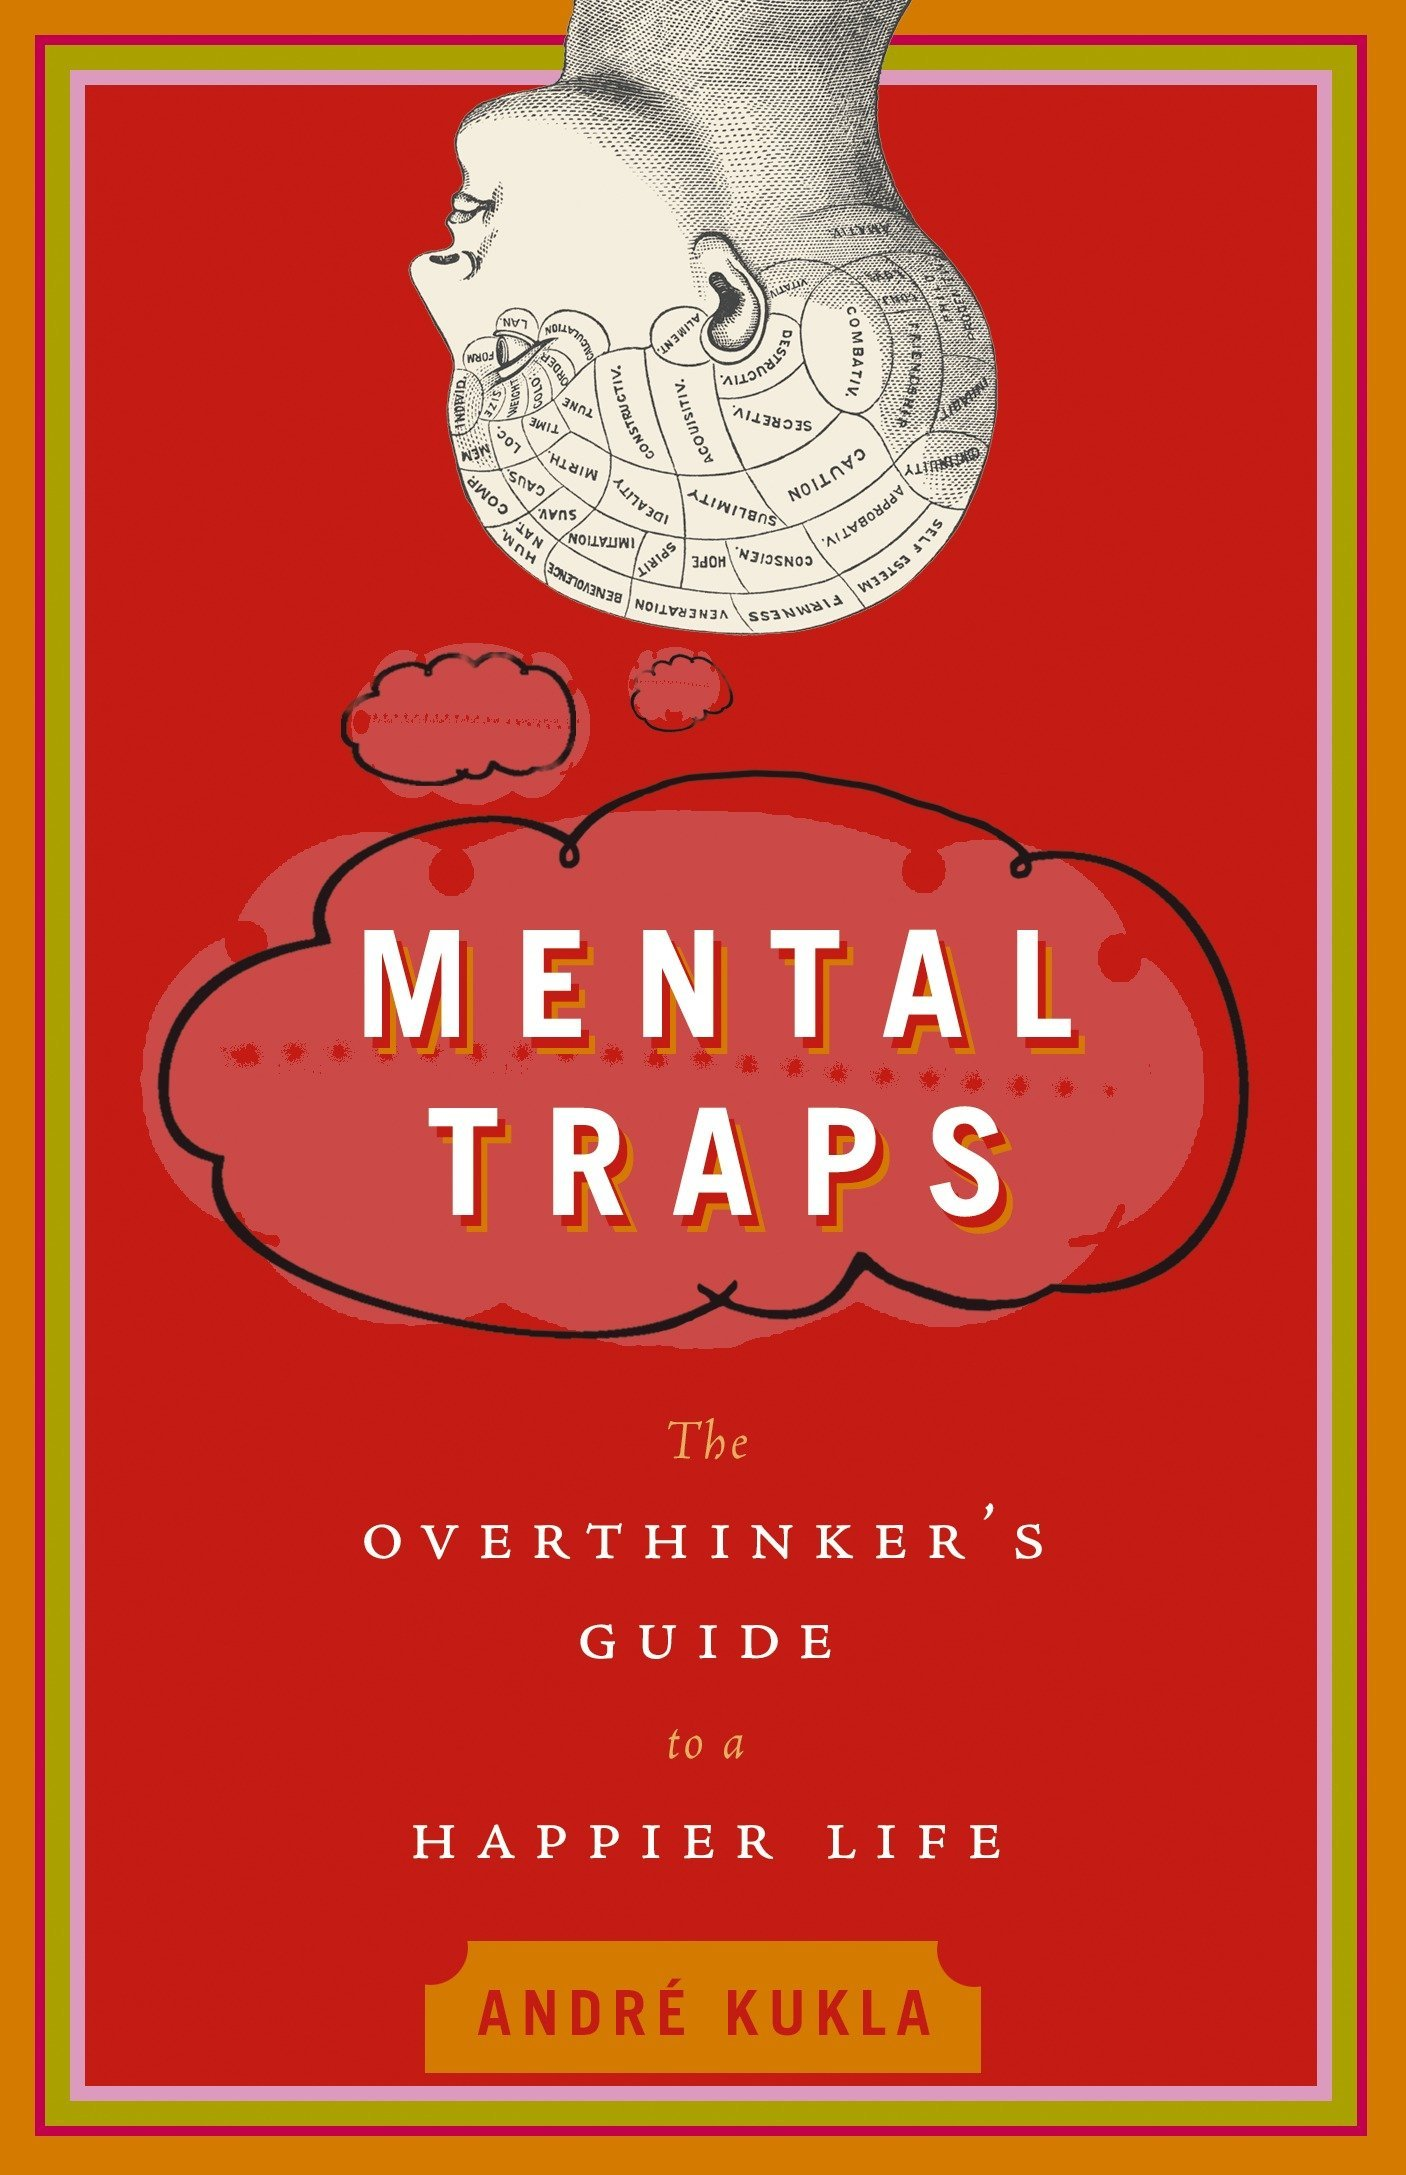 Mental Traps: The Overthinkers Guide to a Happier Life: Amazon.es: Kukla, Andre: Libros en idiomas extranjeros